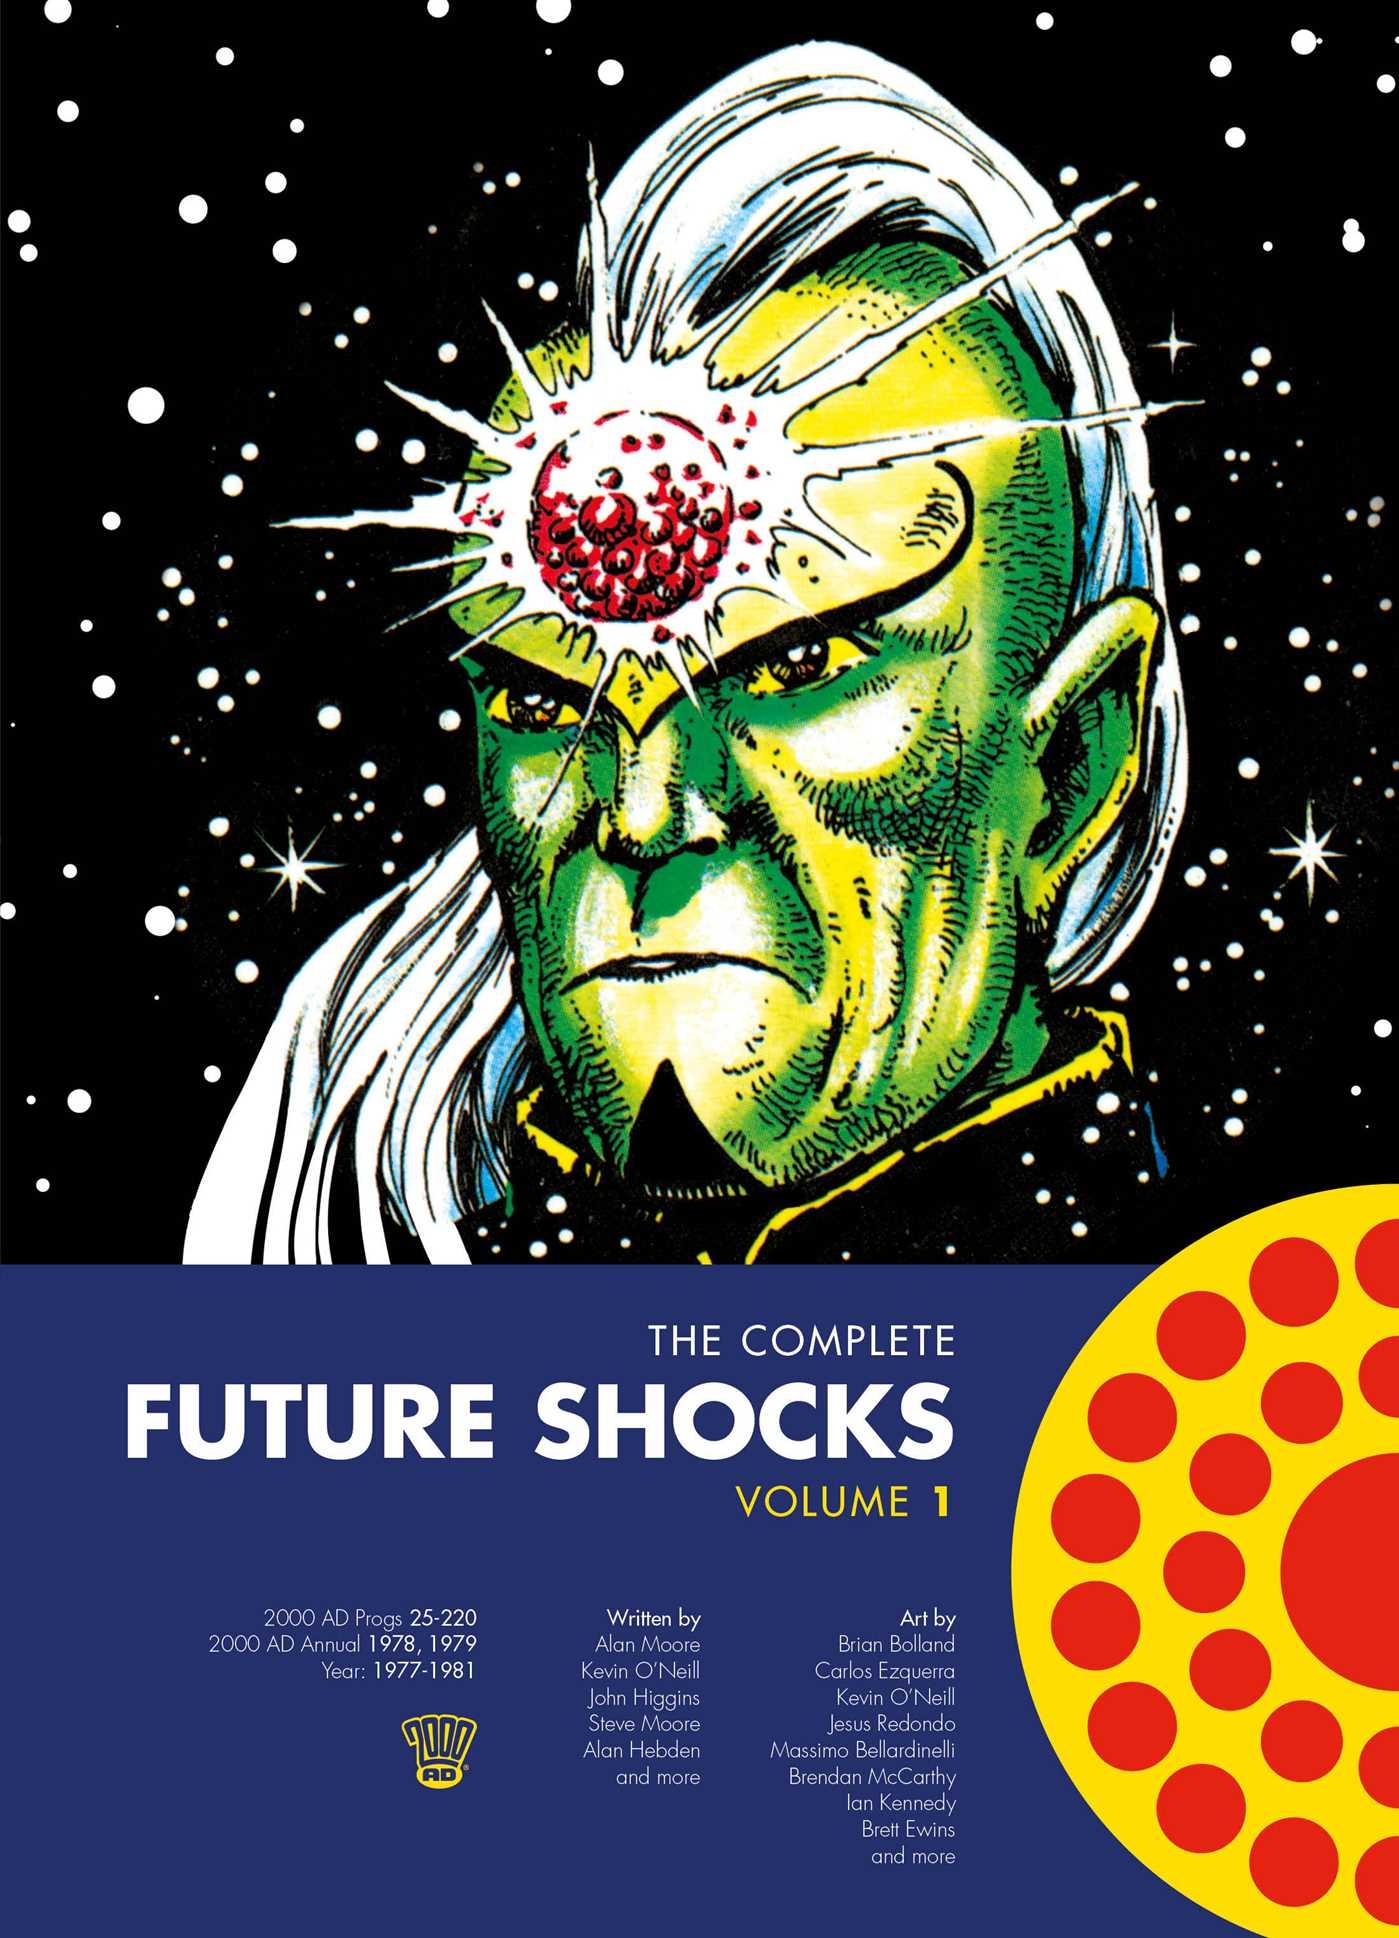 The complete future shocks vol 1 9781781085592 hr